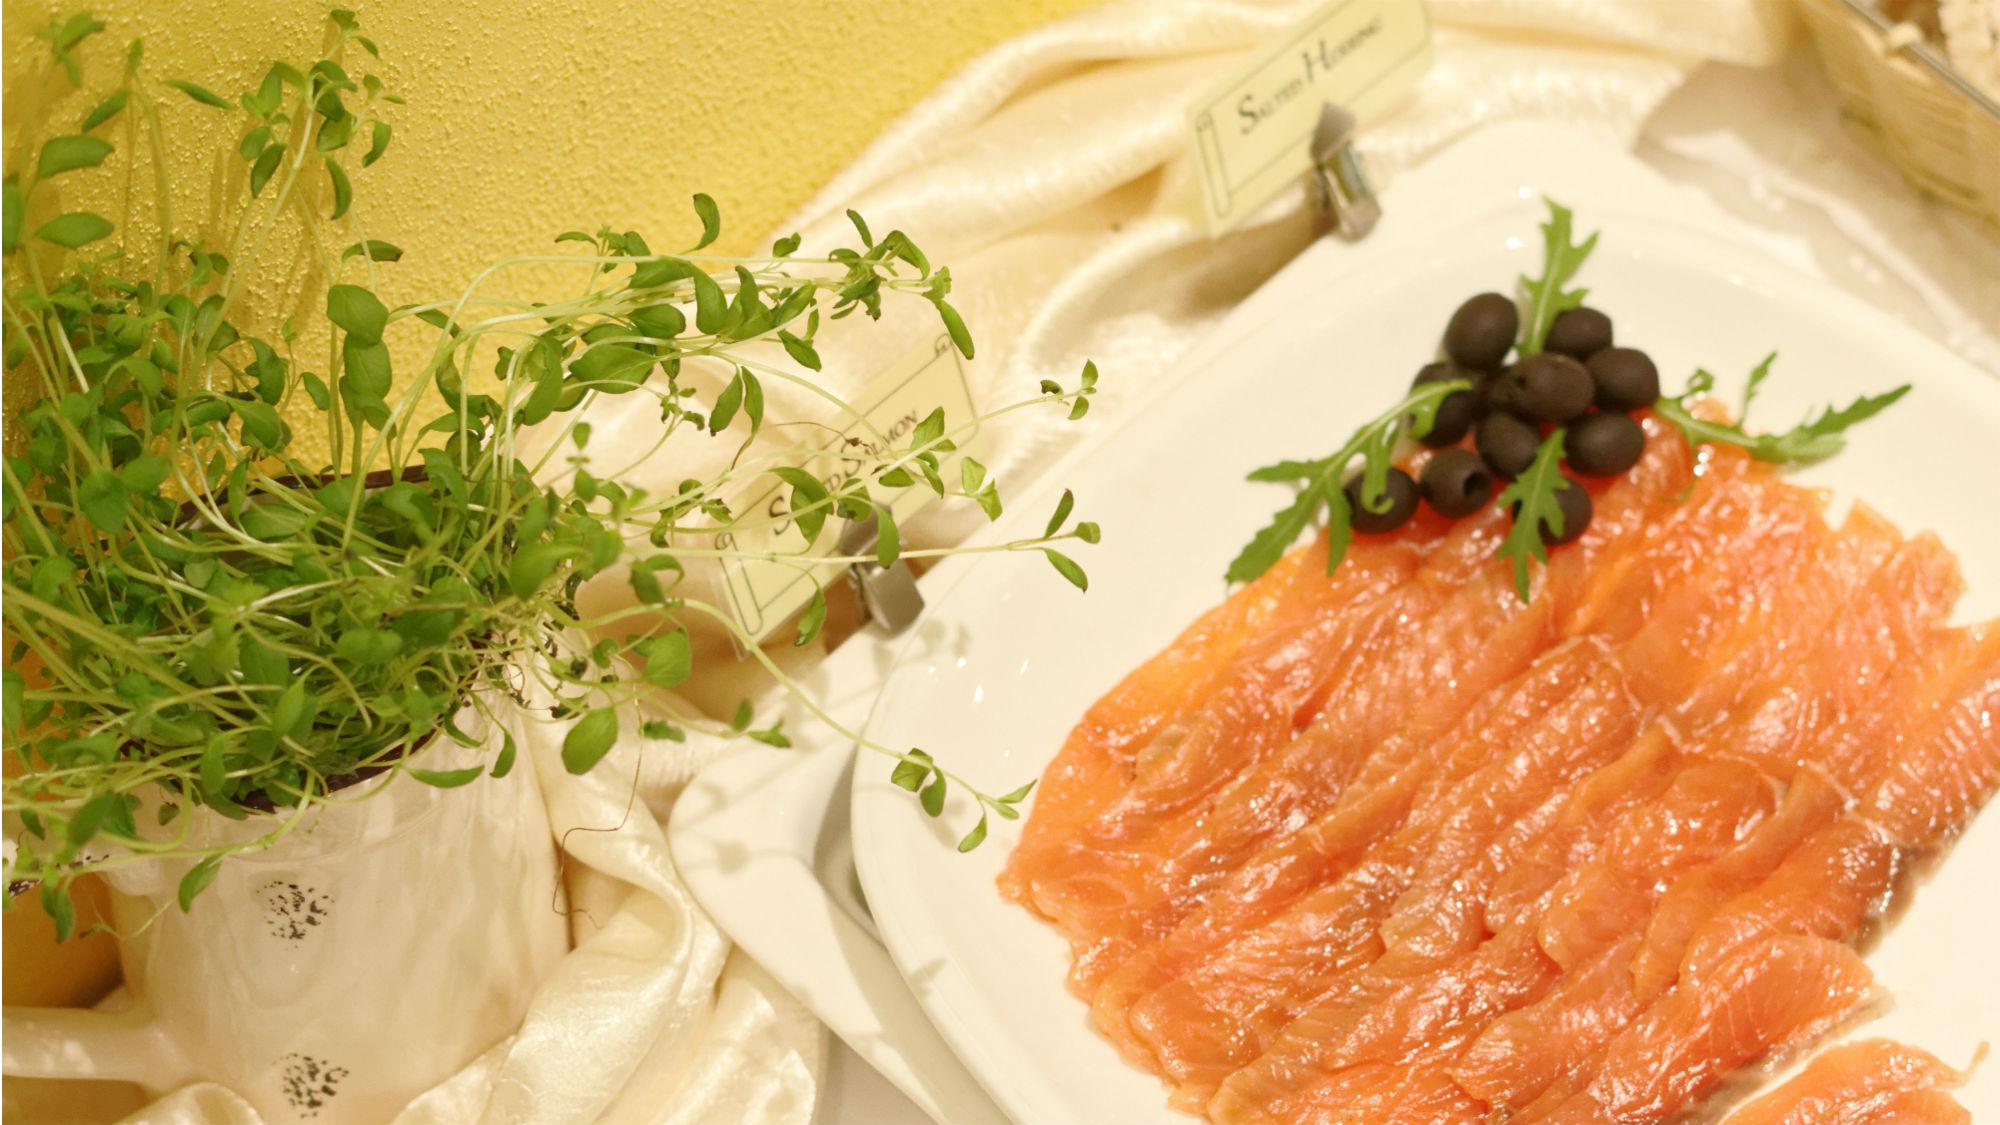 My_City_Hotel_in_Tallinn_restaurant_rich_breakfast